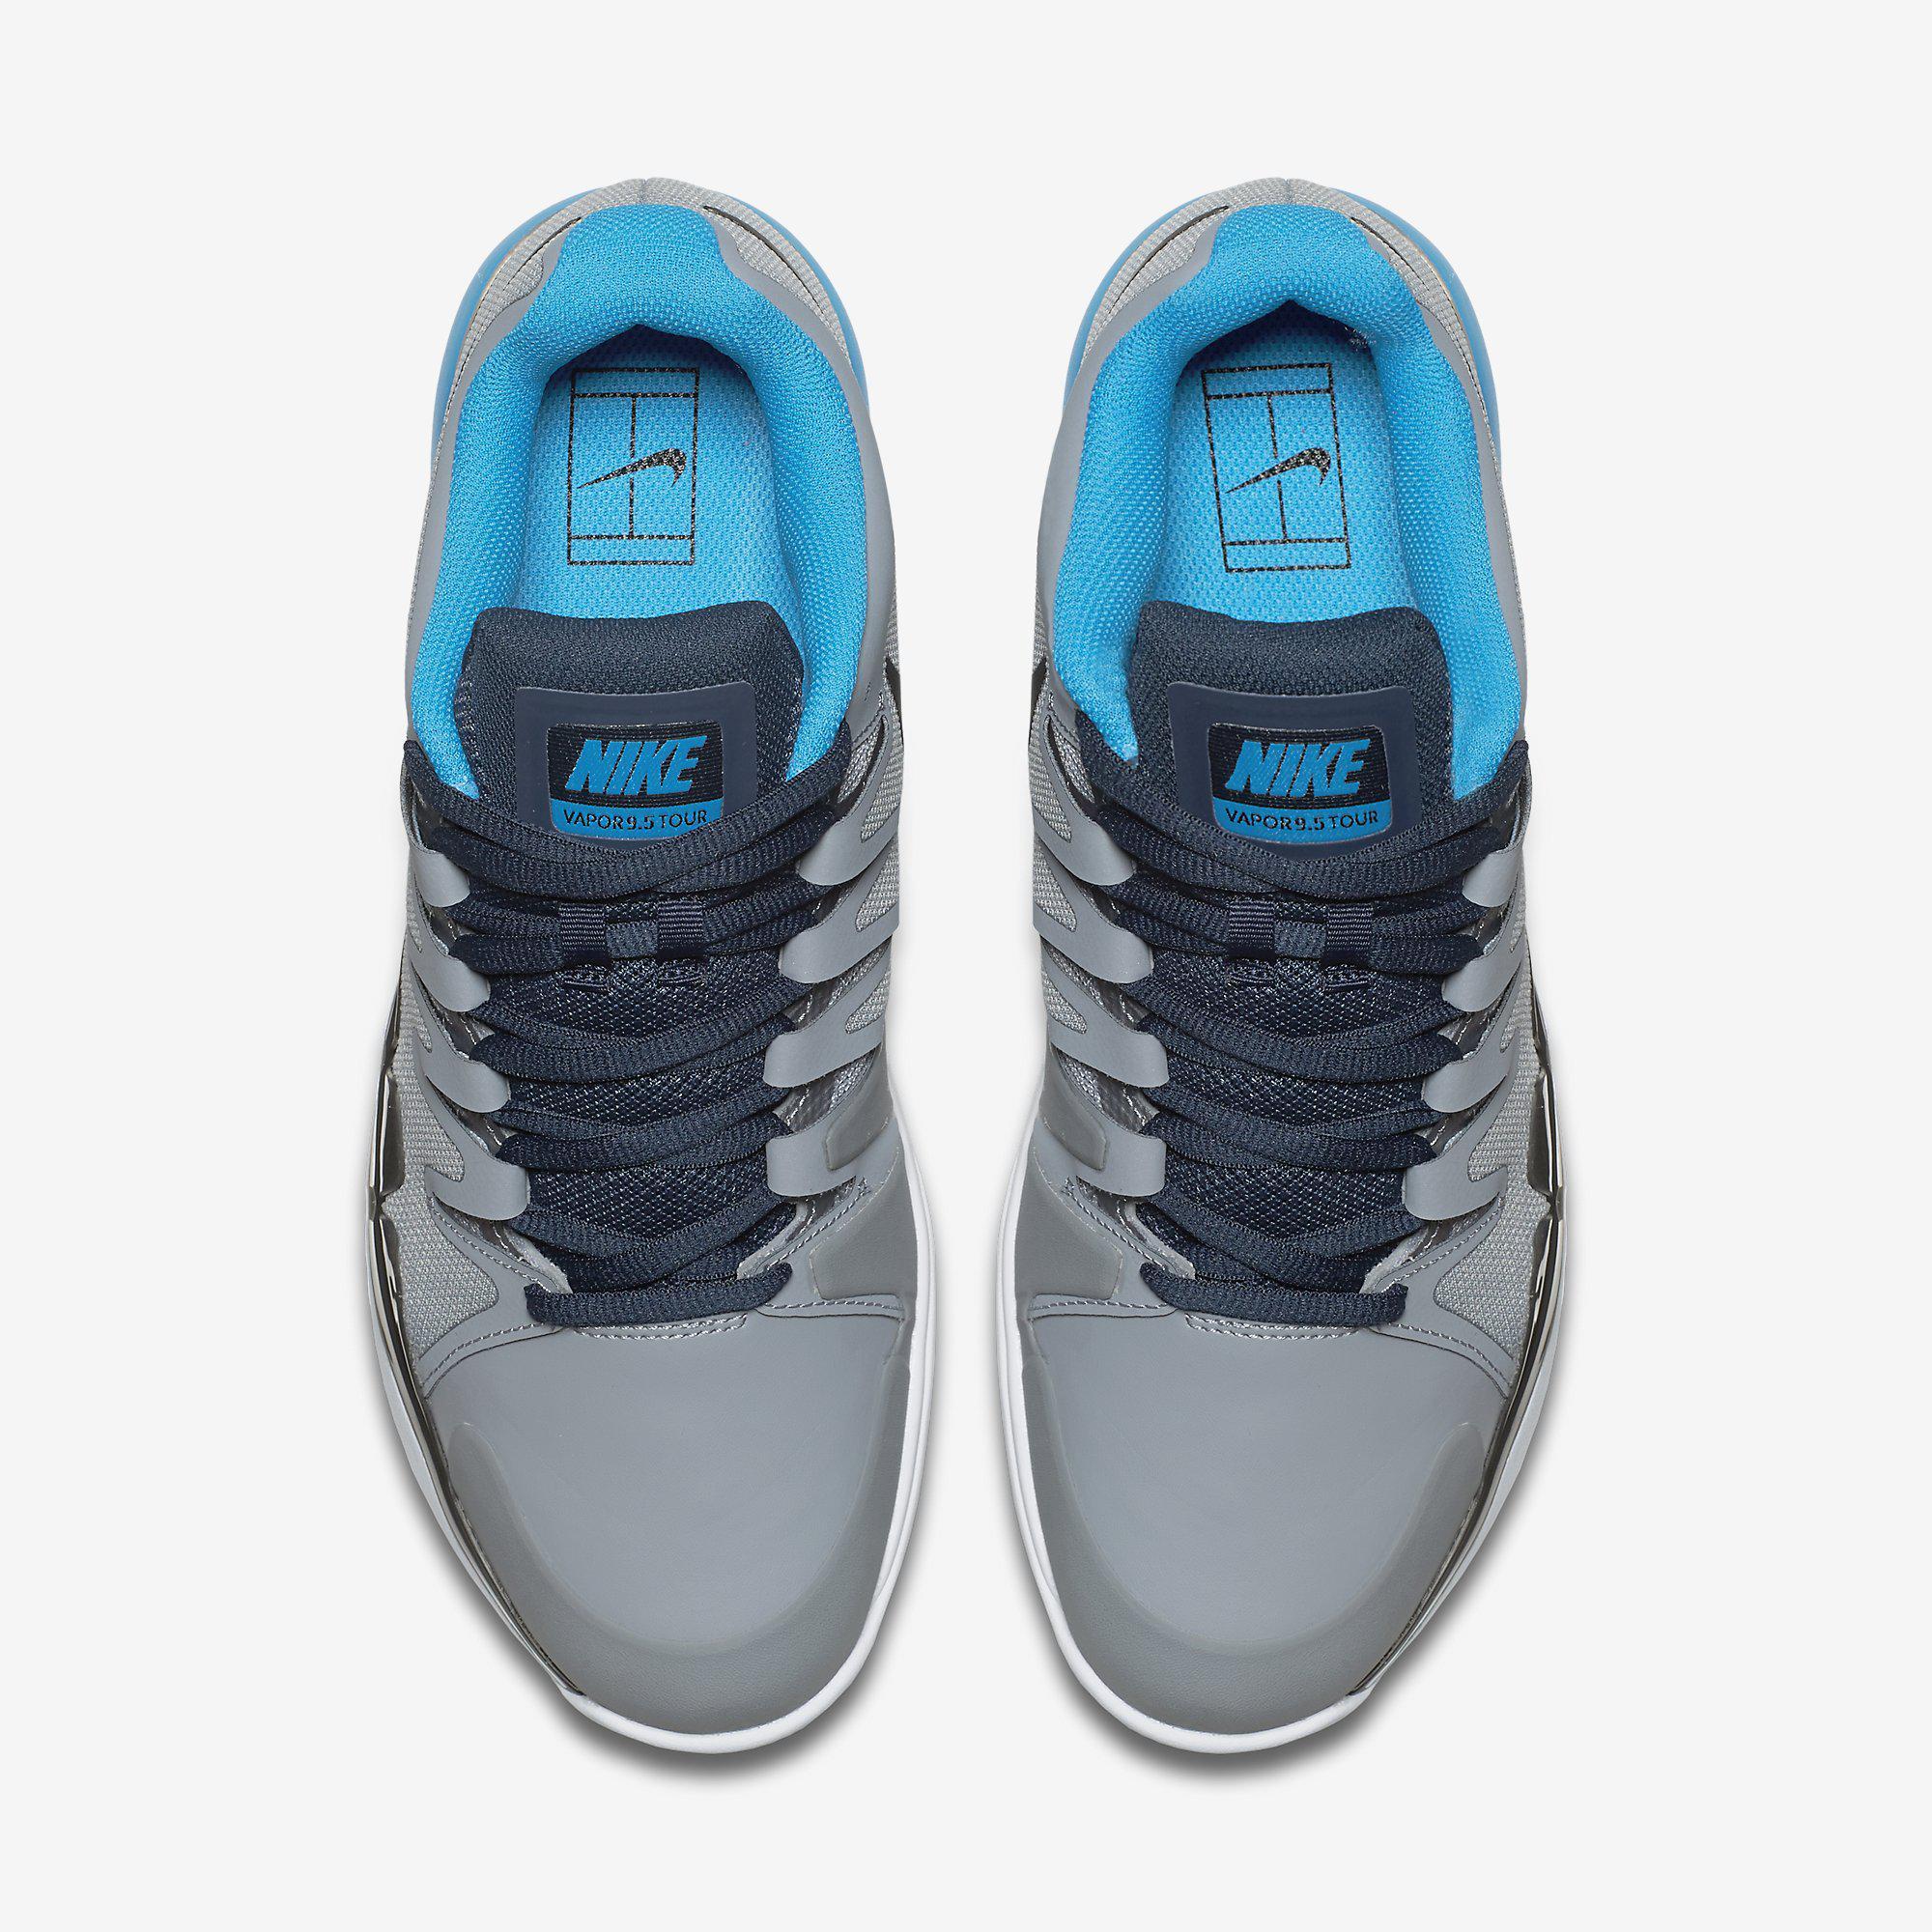 efcc8075d729c2 ... hot nike mens zoom vapor 9.5 tour clay court tennis shoes grey blue  9a20a 6ff10